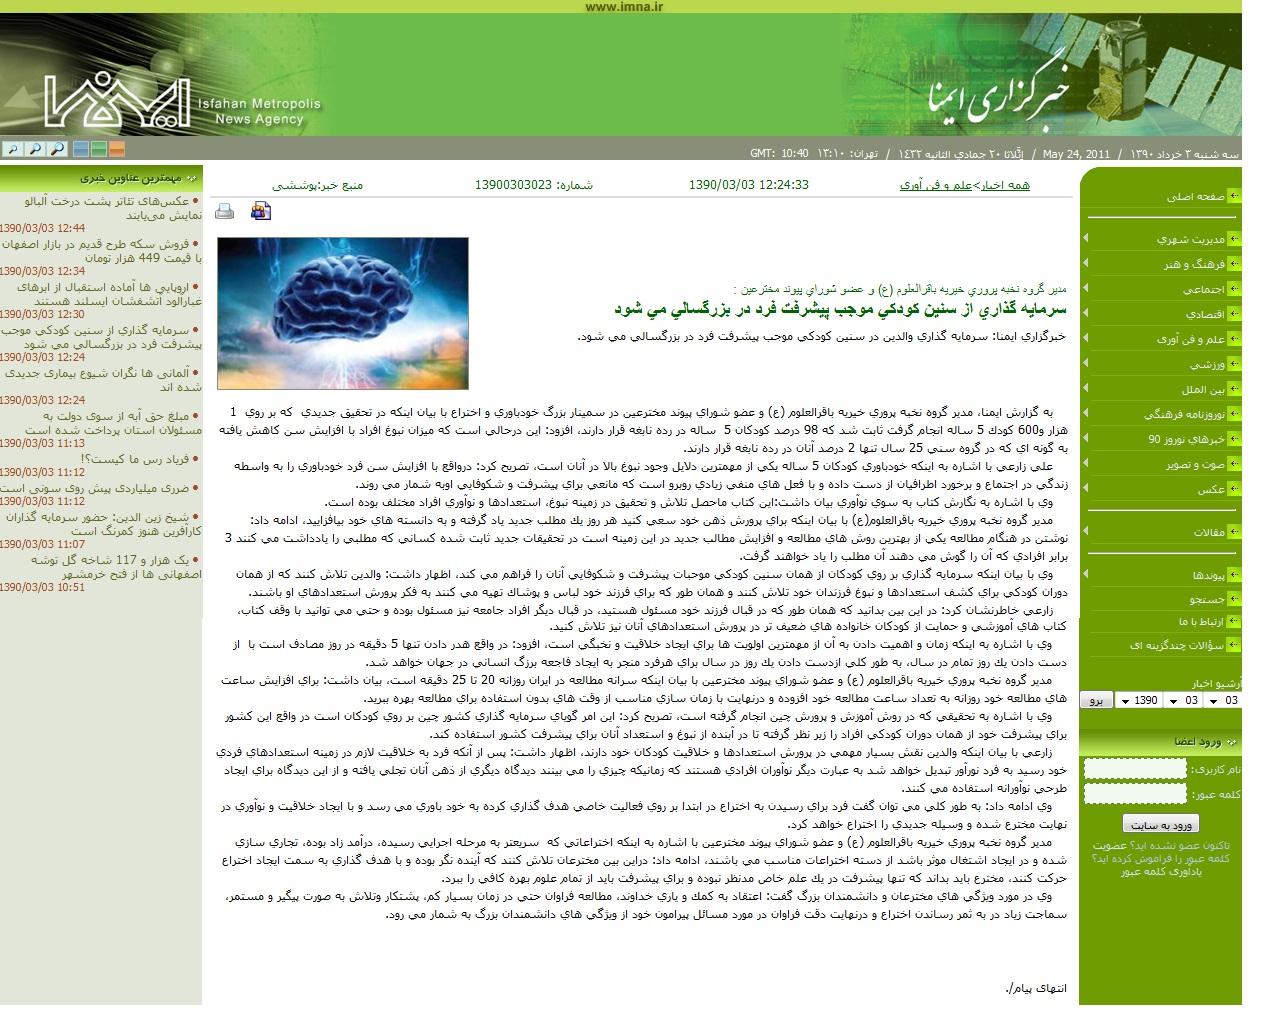 http://www.n-javan.com/khabargozariha/seminar-imna.jpg